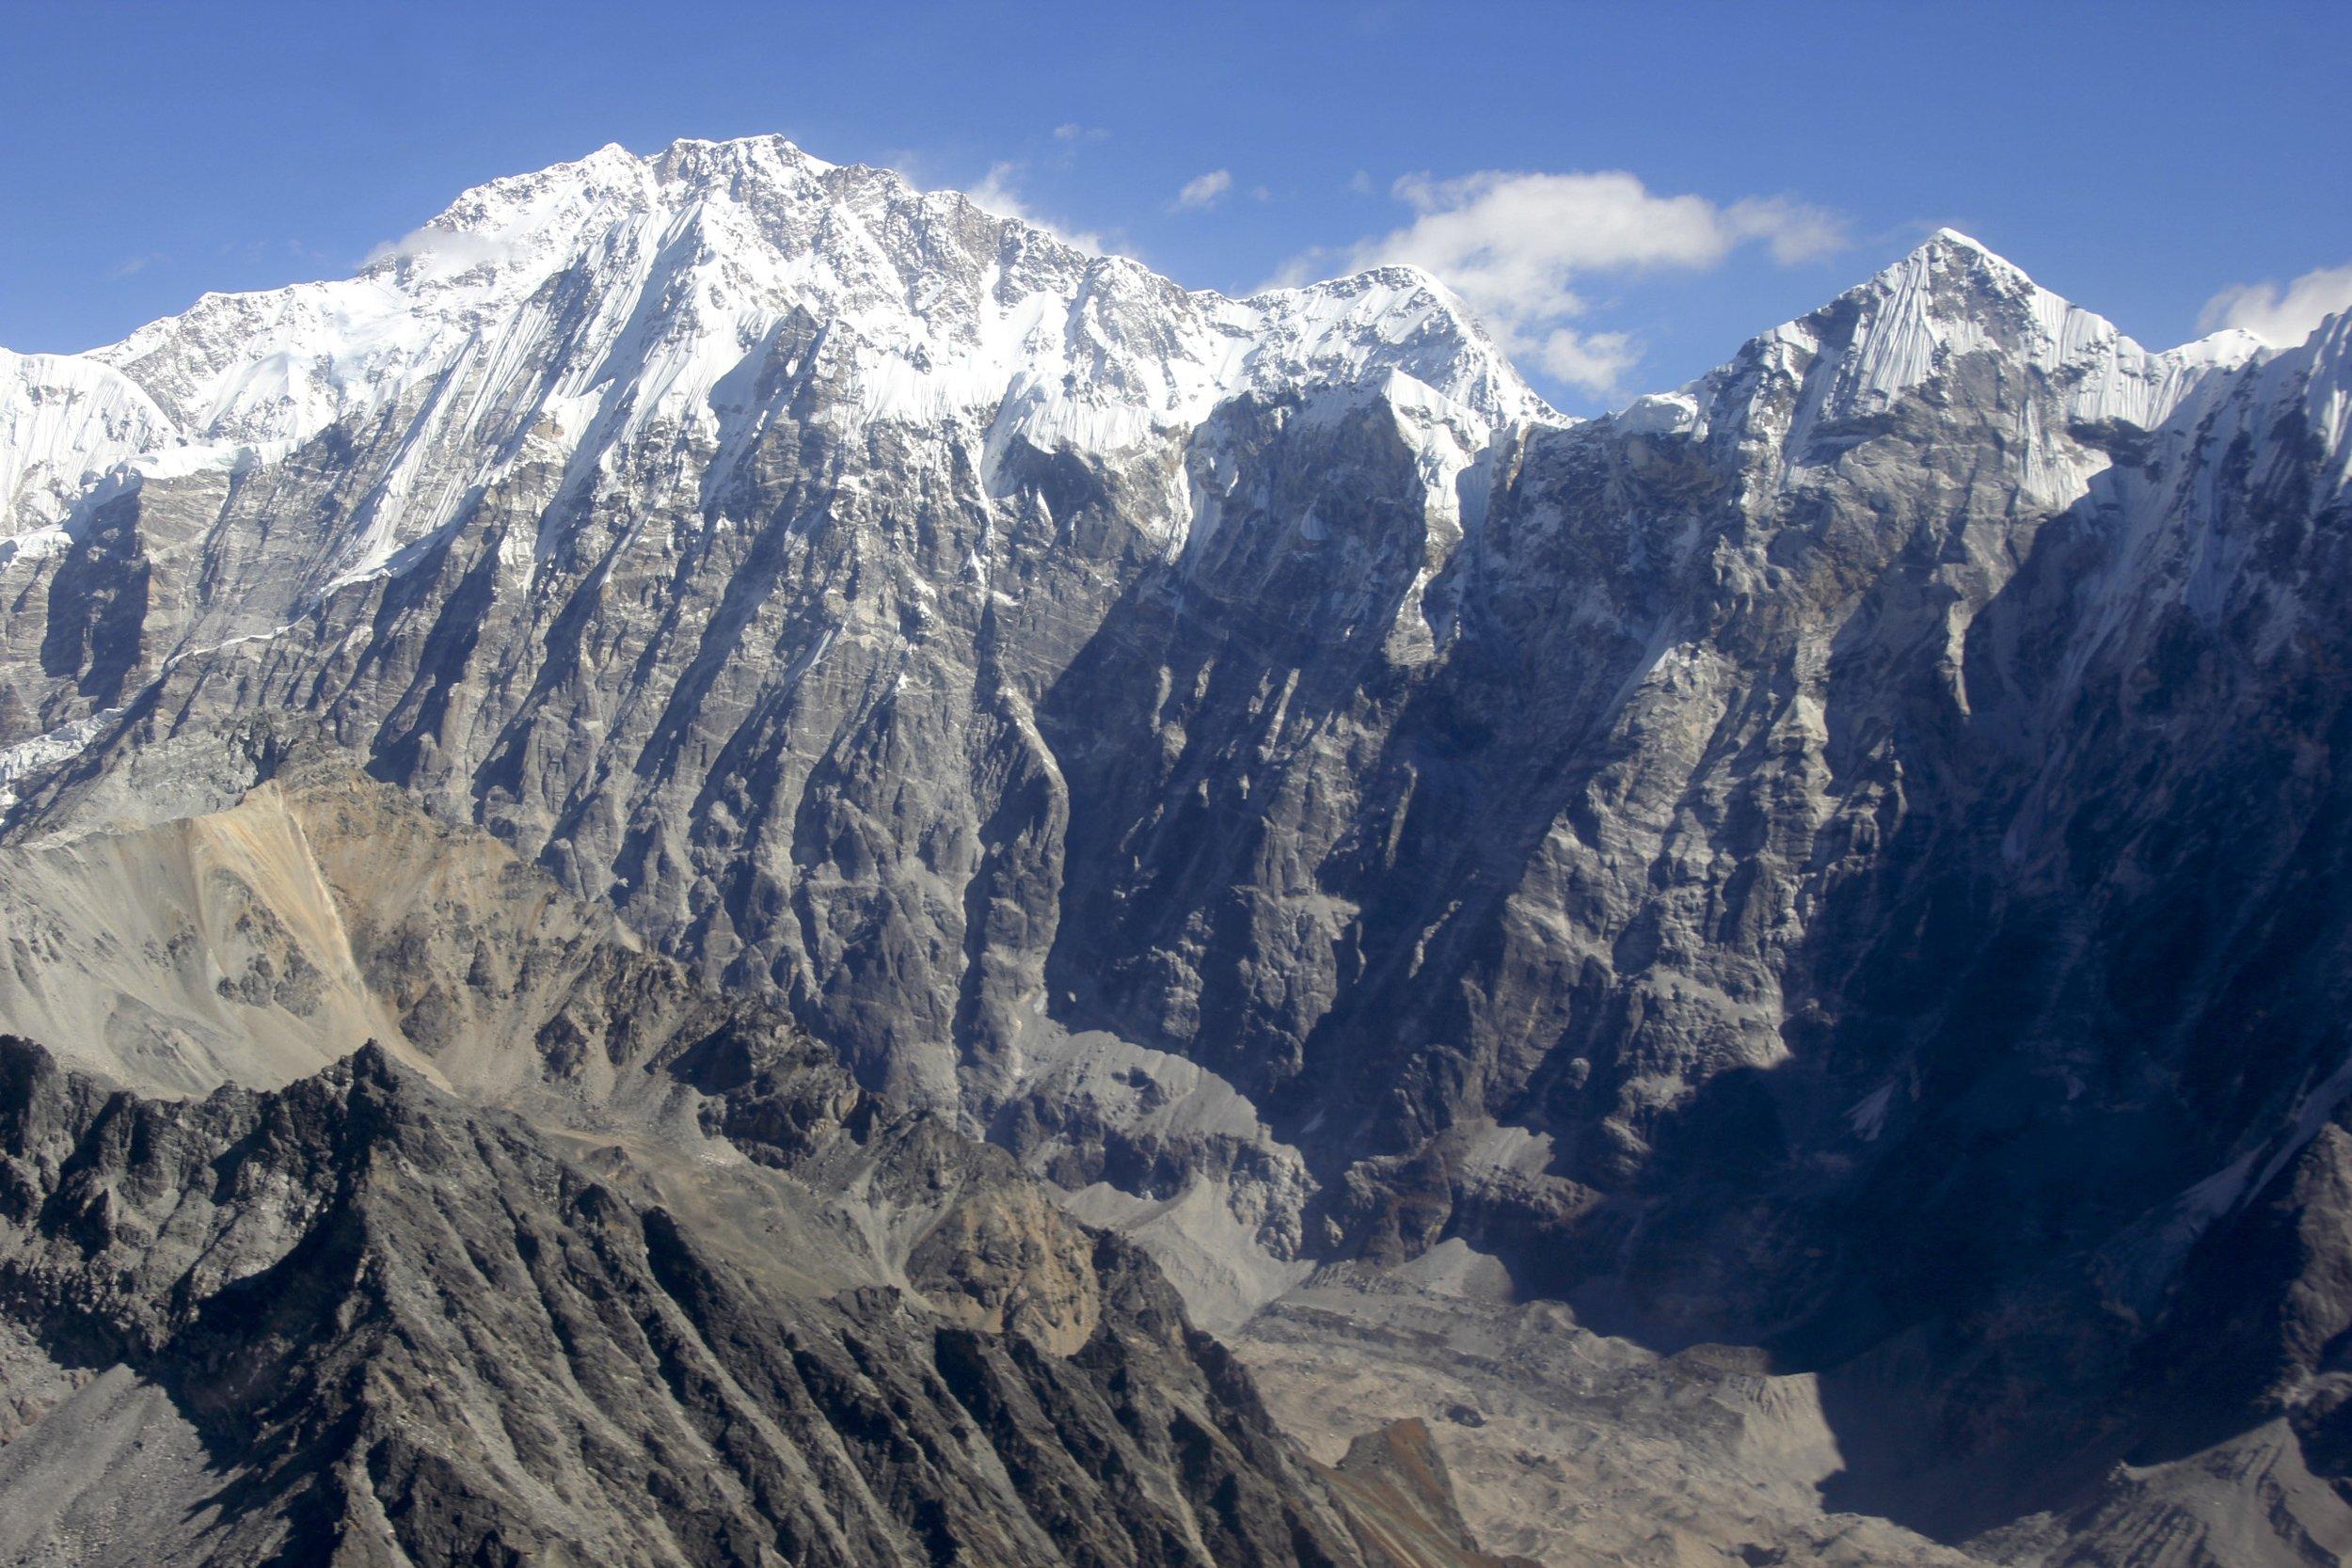 Langtang Glacier and Shishapangma in Tibet (photo from 2018 trip - see 2018 year)